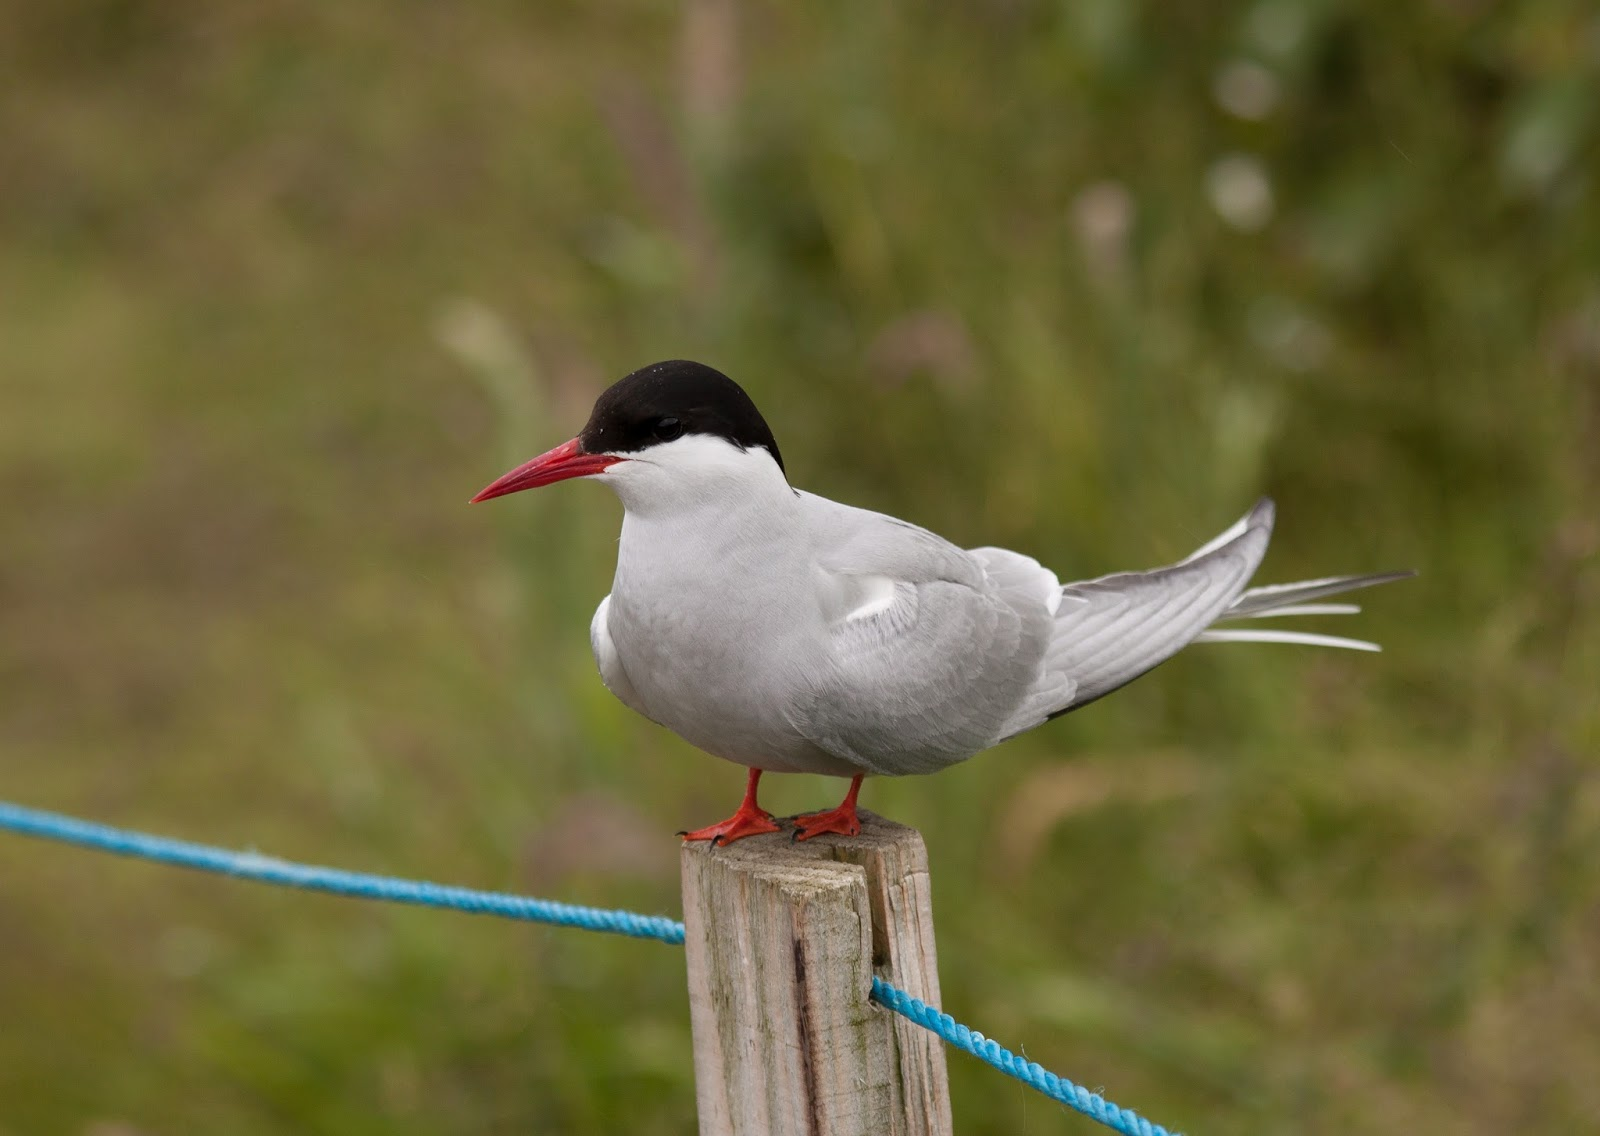 Arctic Tern - Farne Islands, Northumberland